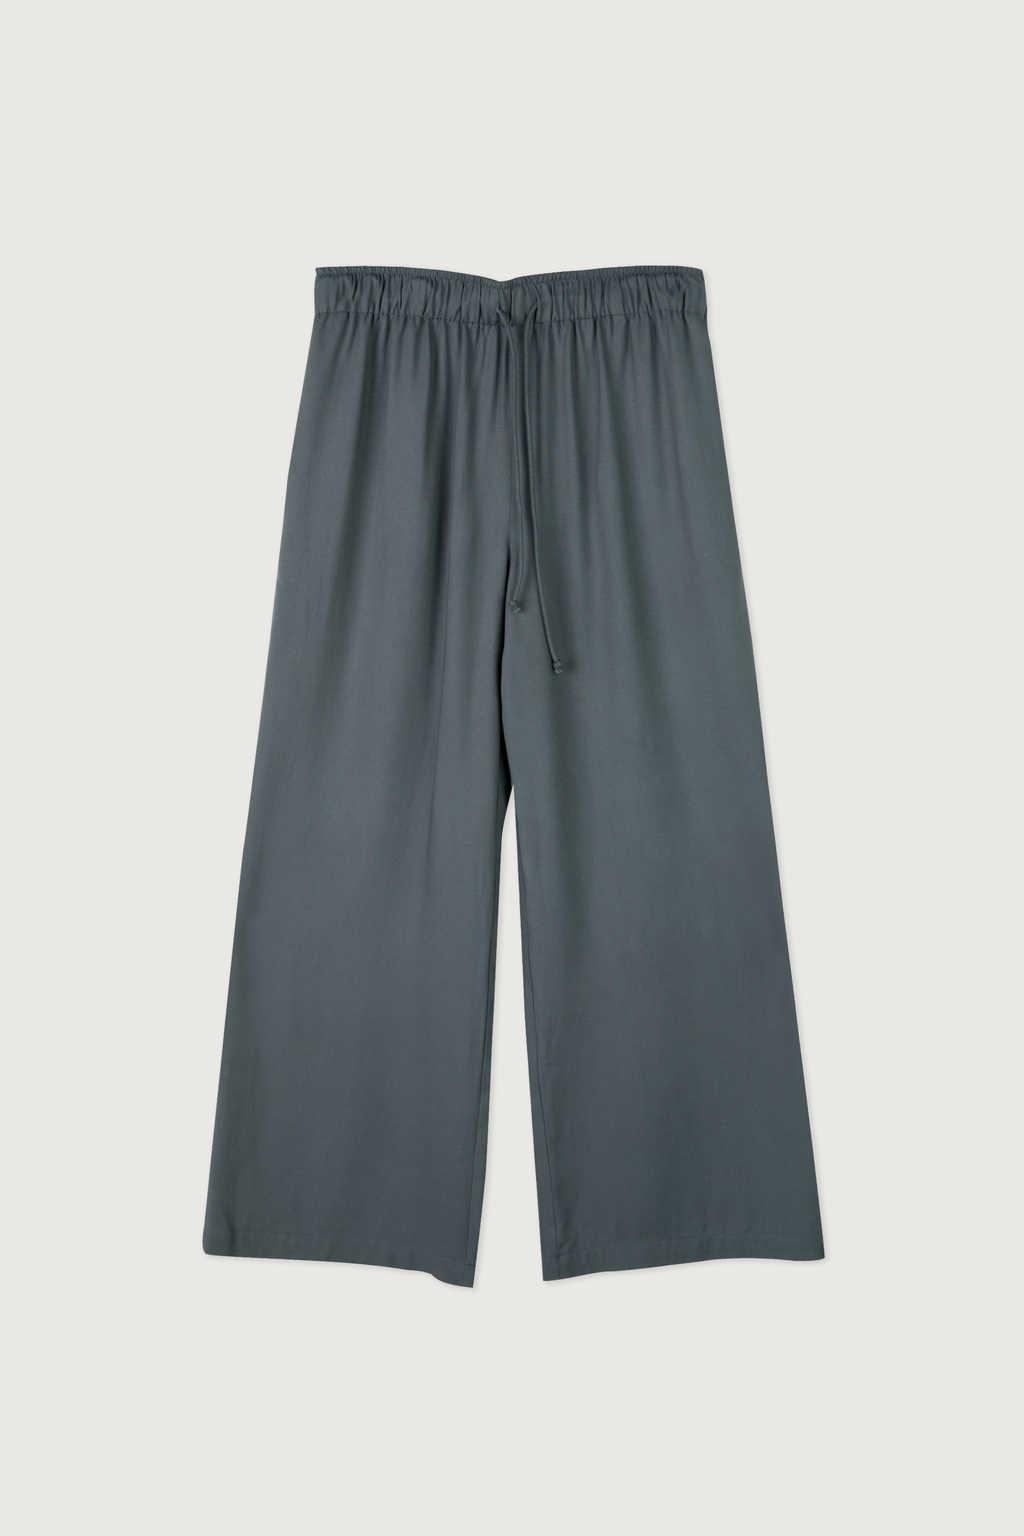 Pant 3259 Gray 12